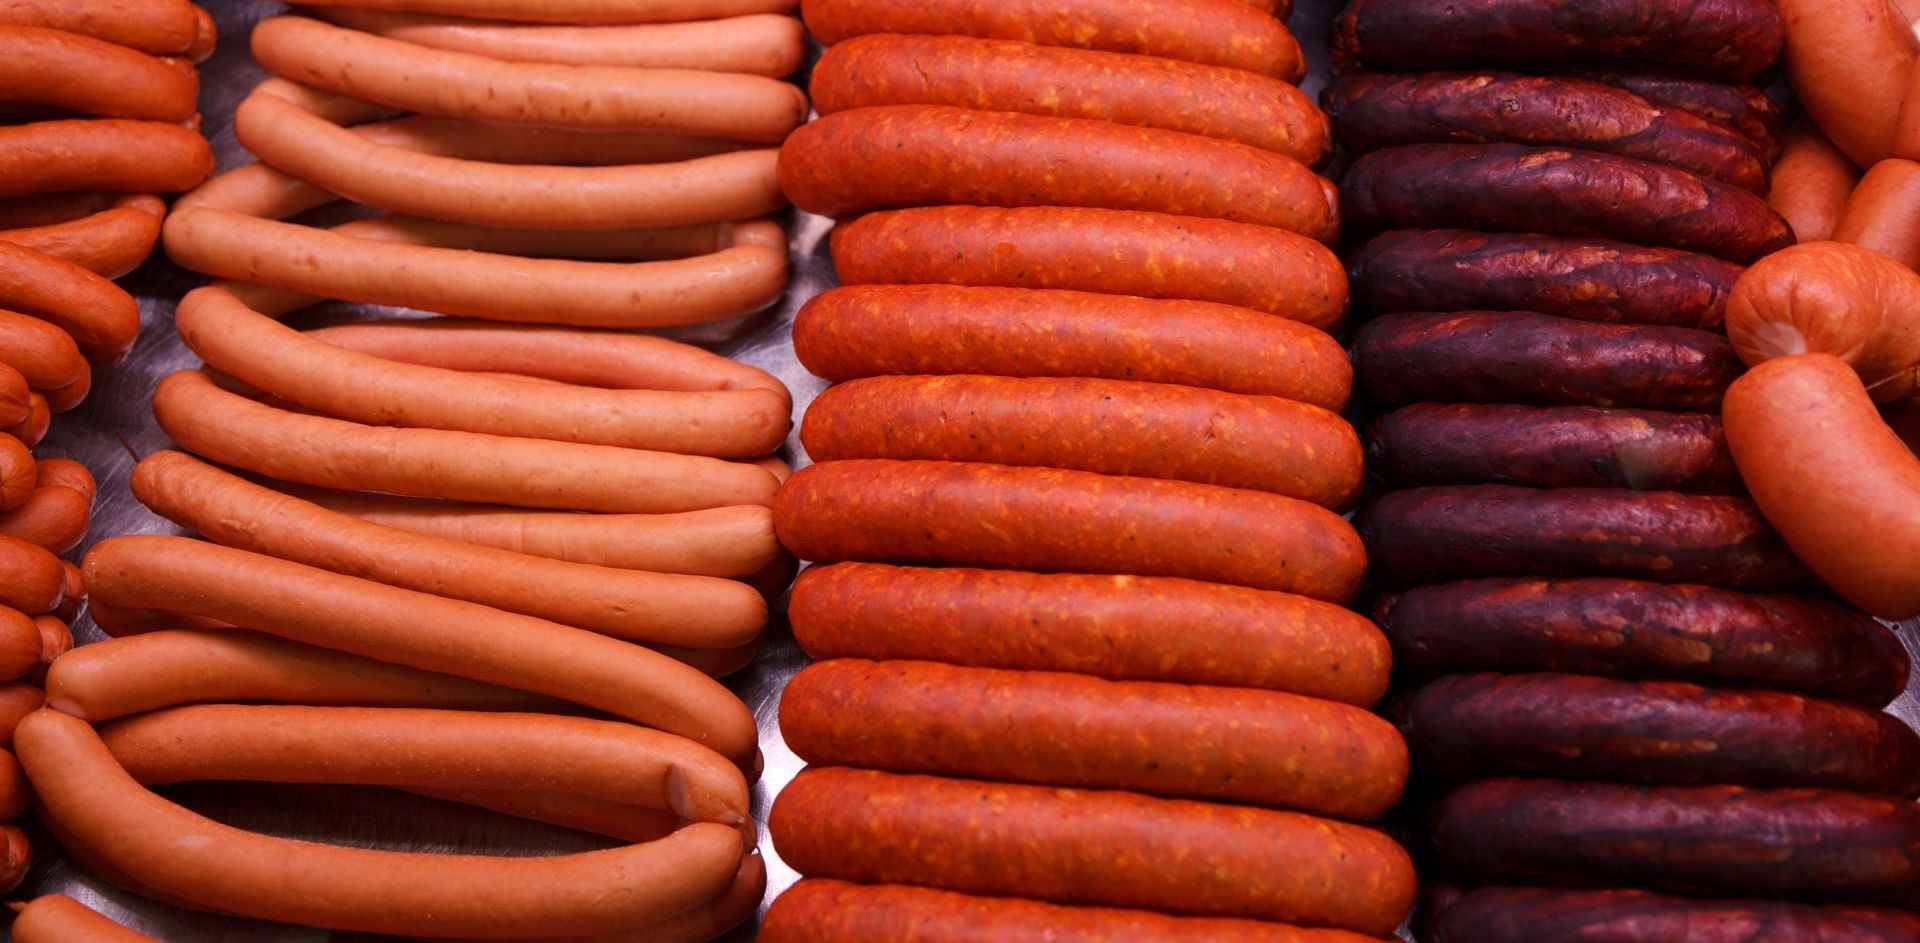 WHO UPOZORAVA Prerađeno crveno meso jednako kancerogeno kao duhan, alkohol ili azbest